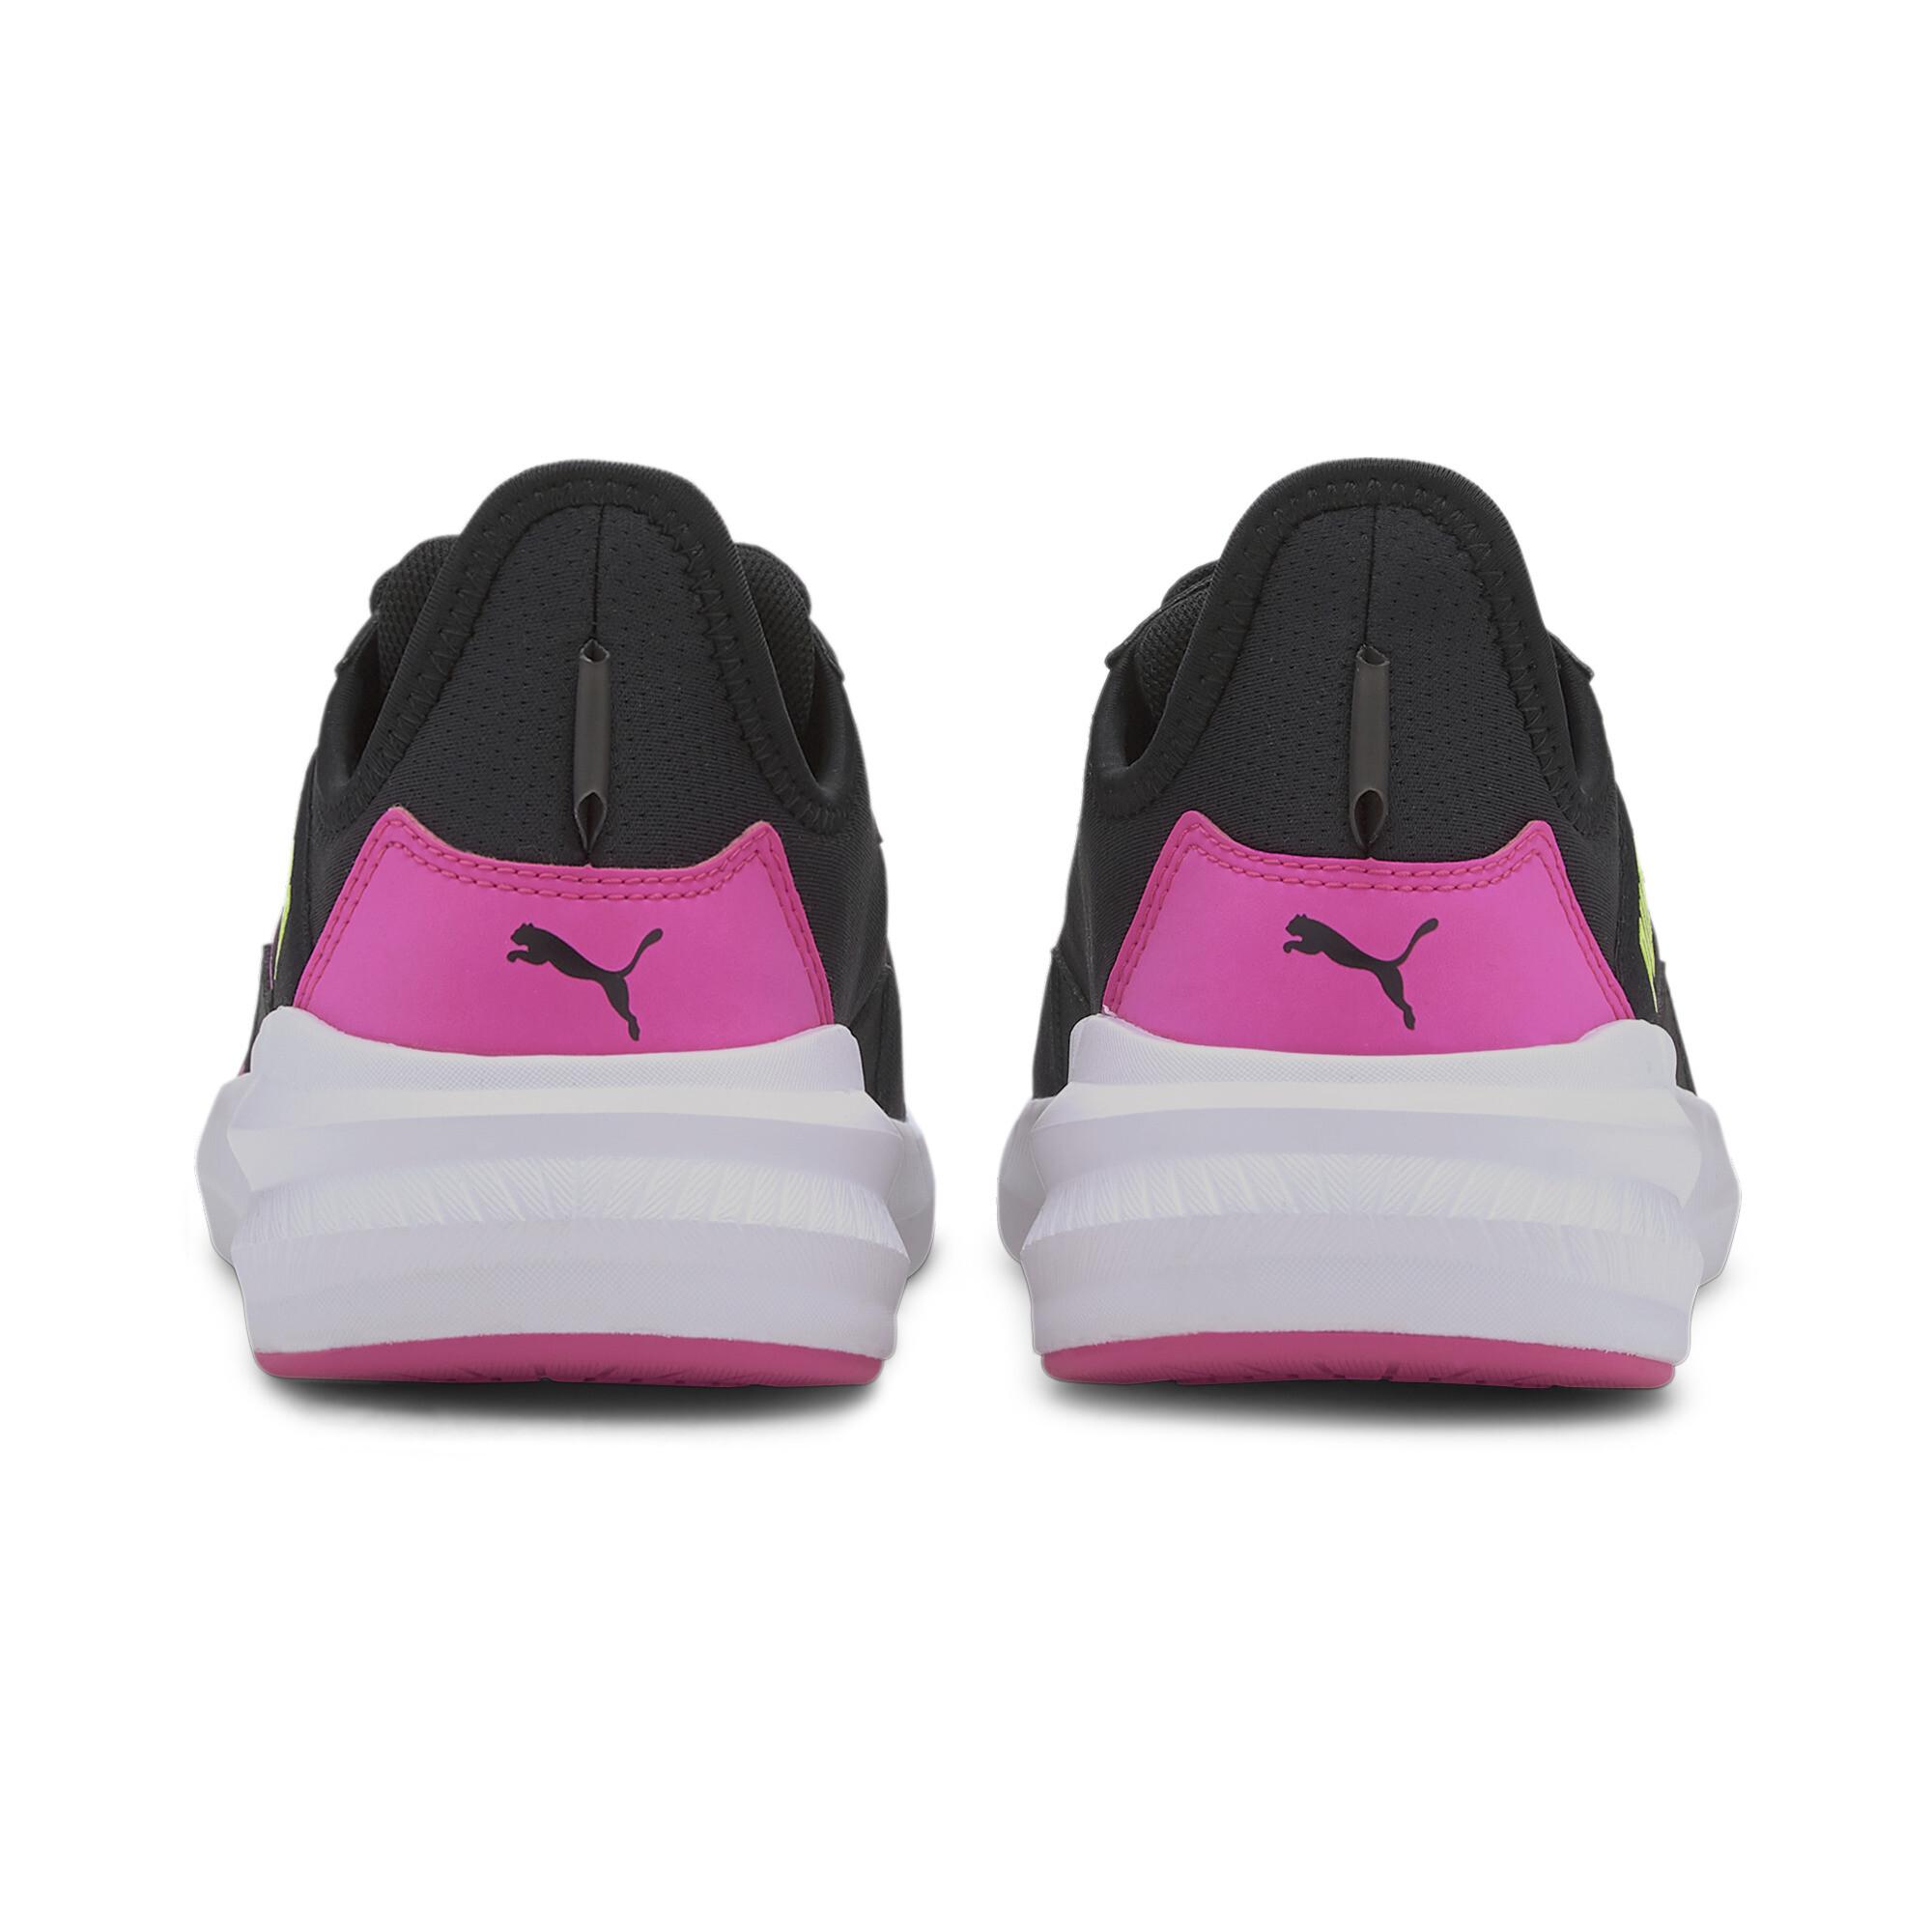 thumbnail 3 - PUMA-Women-039-s-Platinum-Training-Shoes